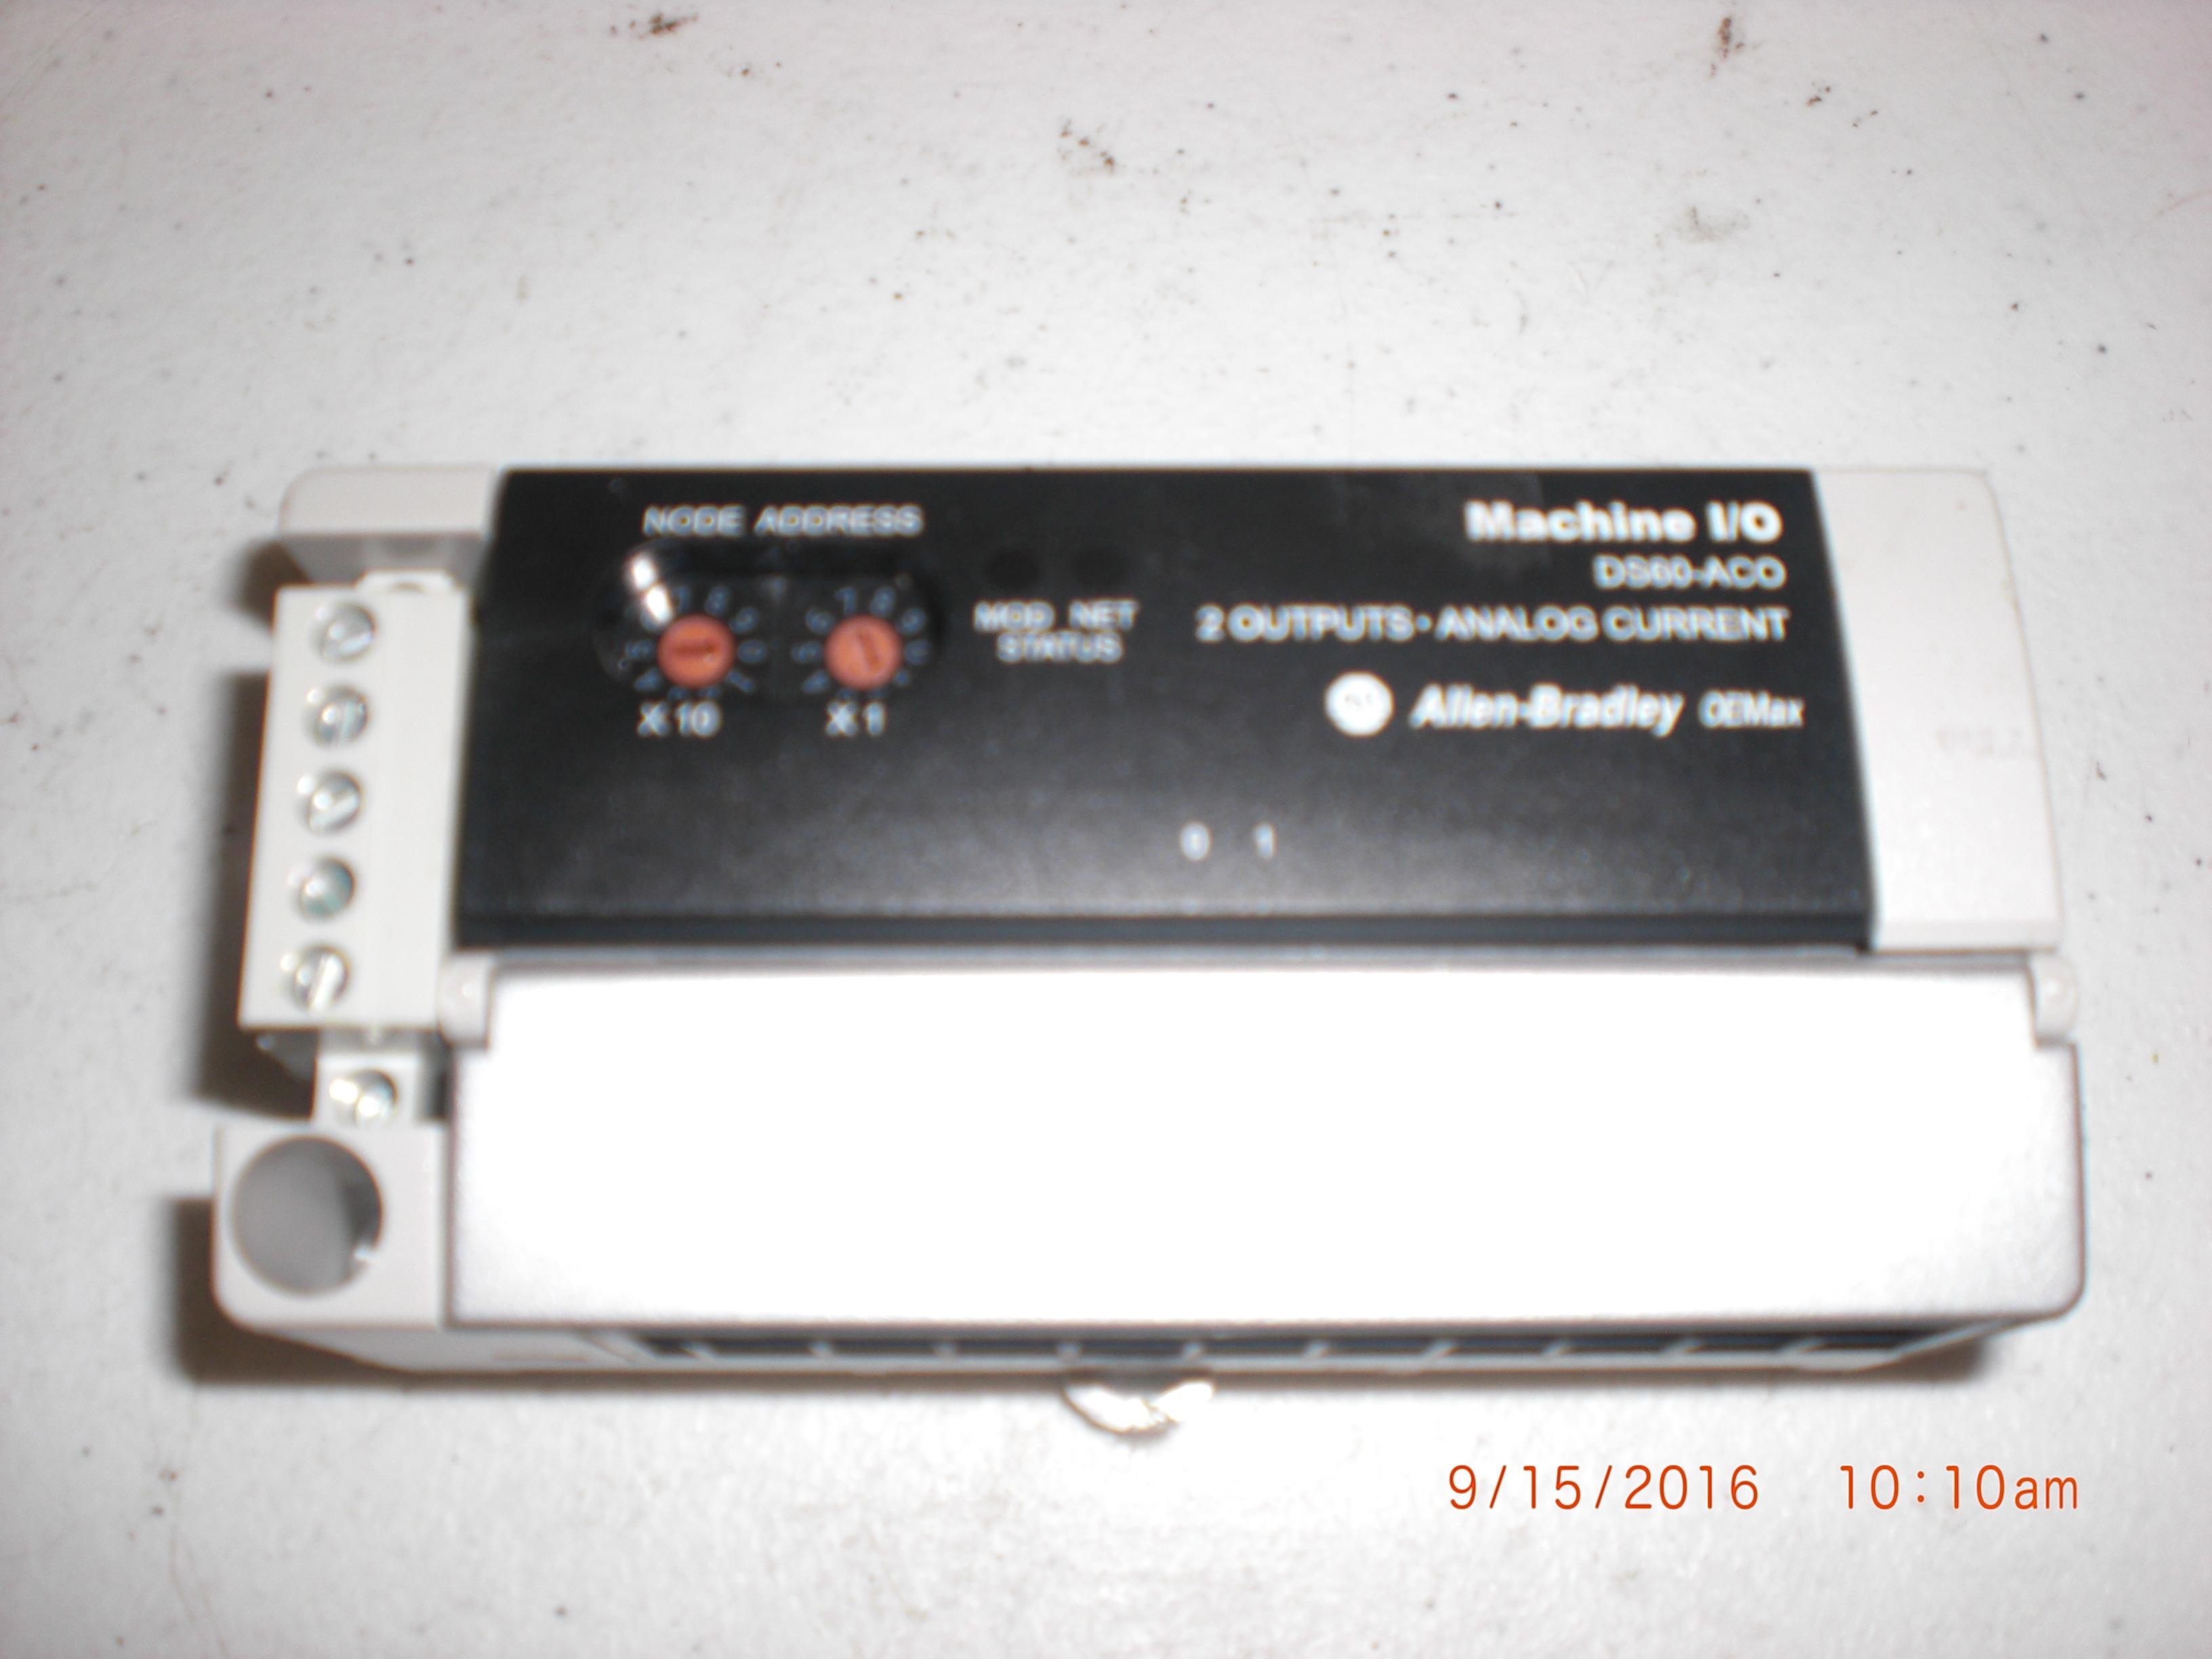 PLC ALLEN-BRADLEY DS60-ACO  OEMax Machine I/O basic OE MAX